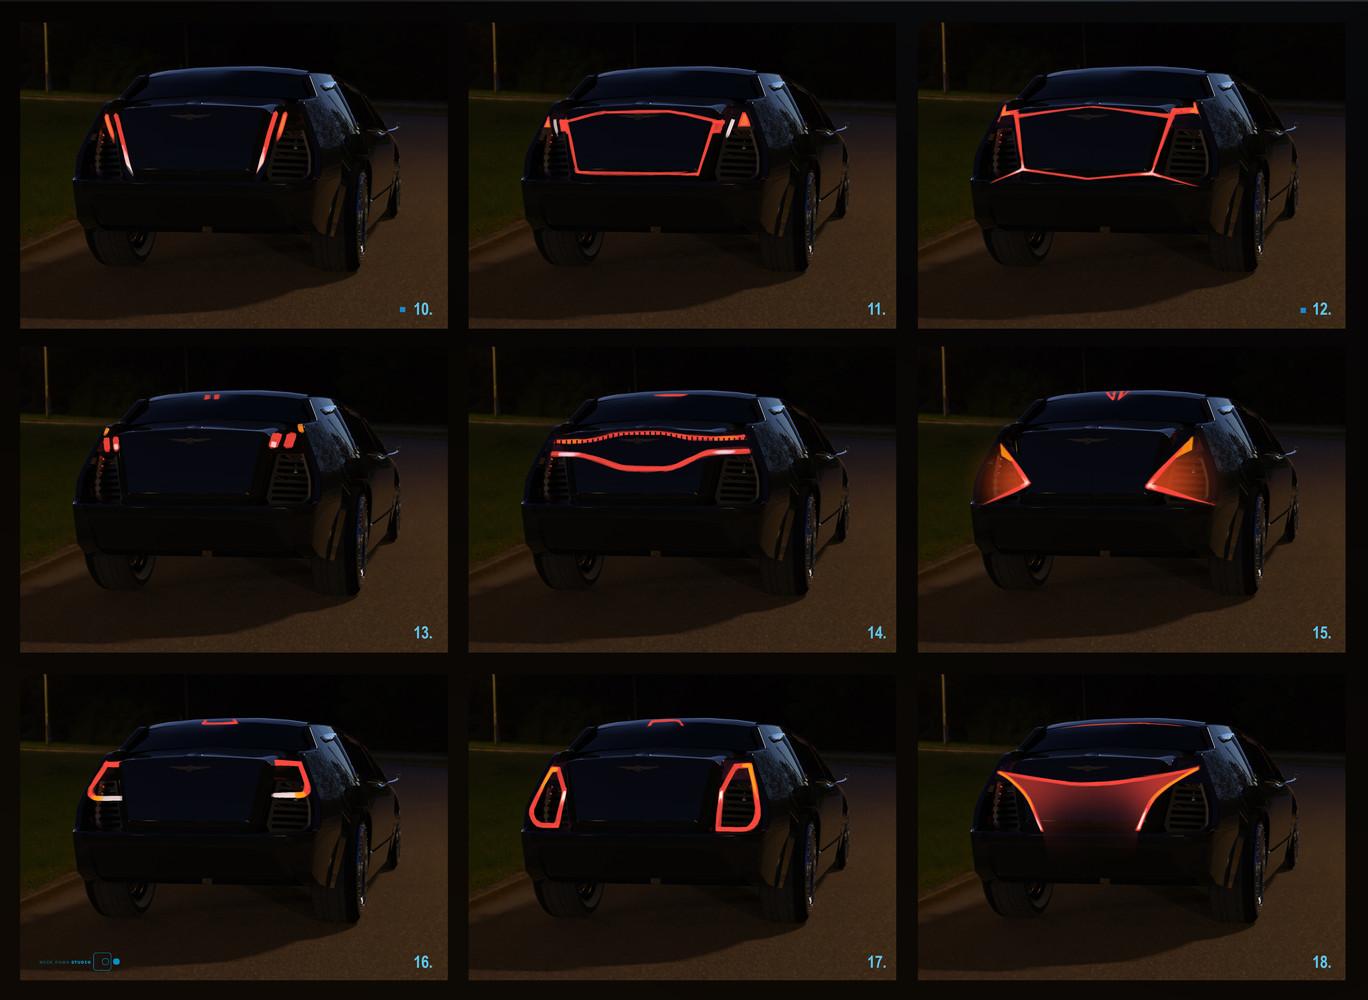 taillights10-18.jpg